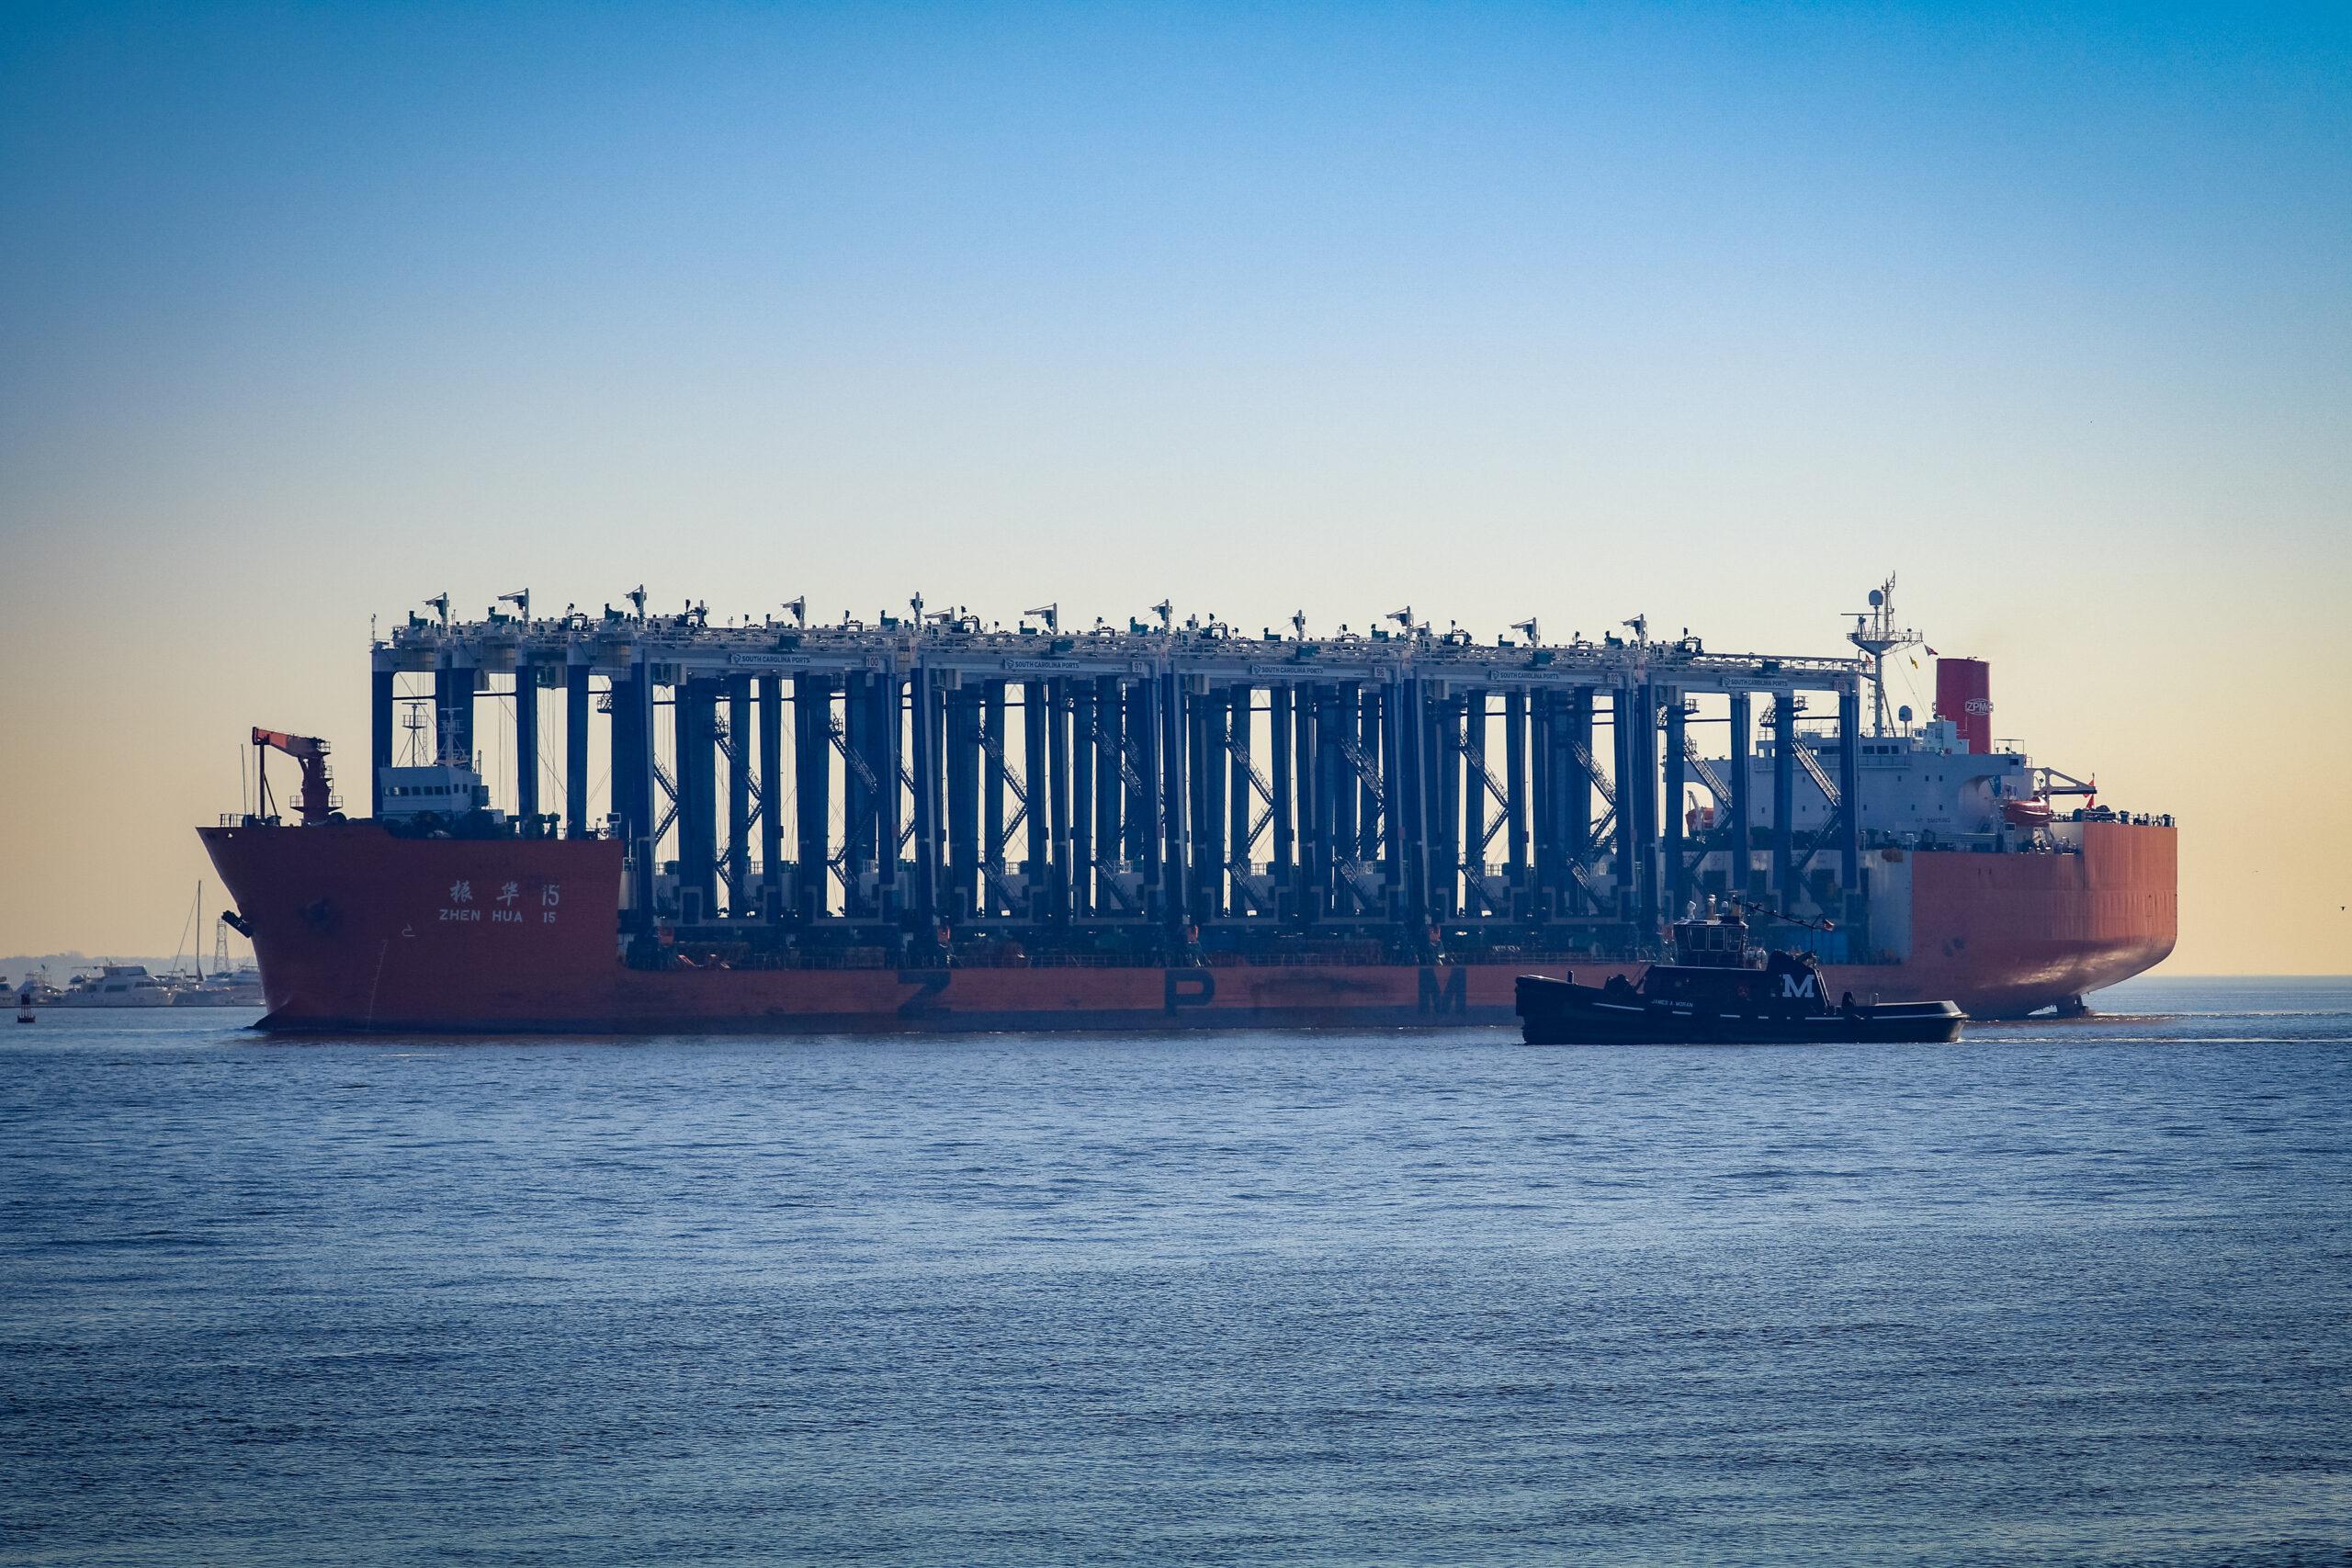 15 RTG cranes bound for Hugh Leatherman Terminal